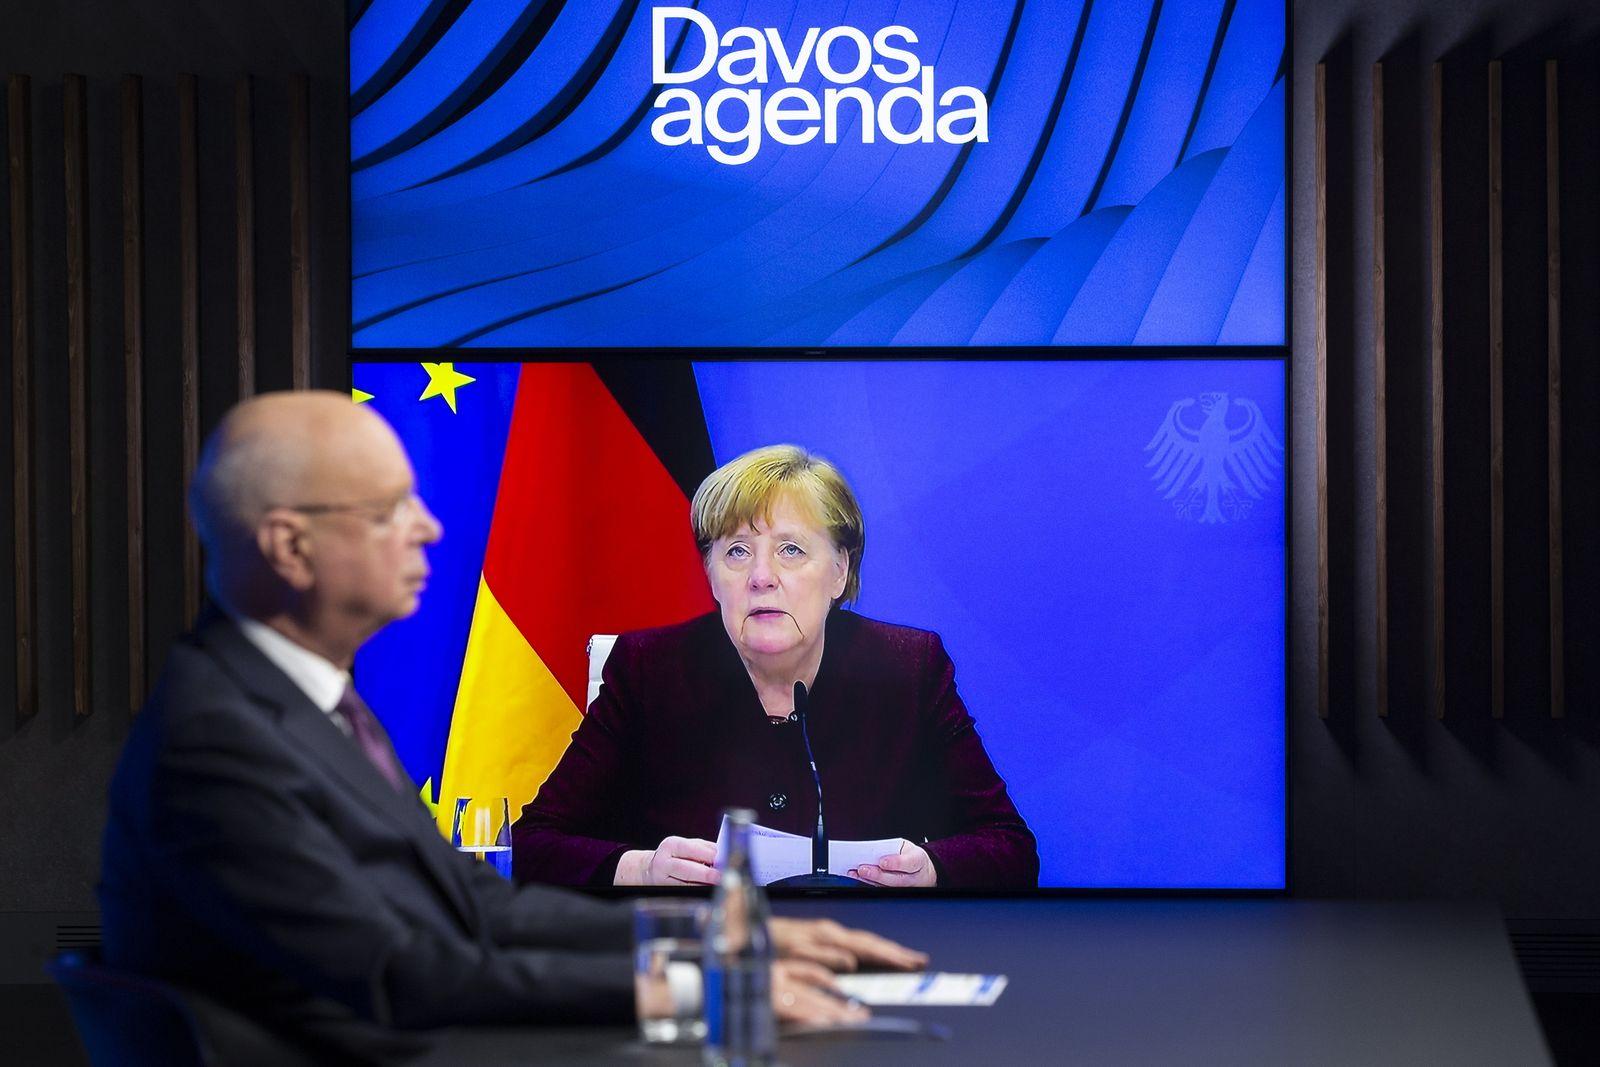 Davos Agenda online meeting, Cologny, Switzerland - 26 Jan 2021